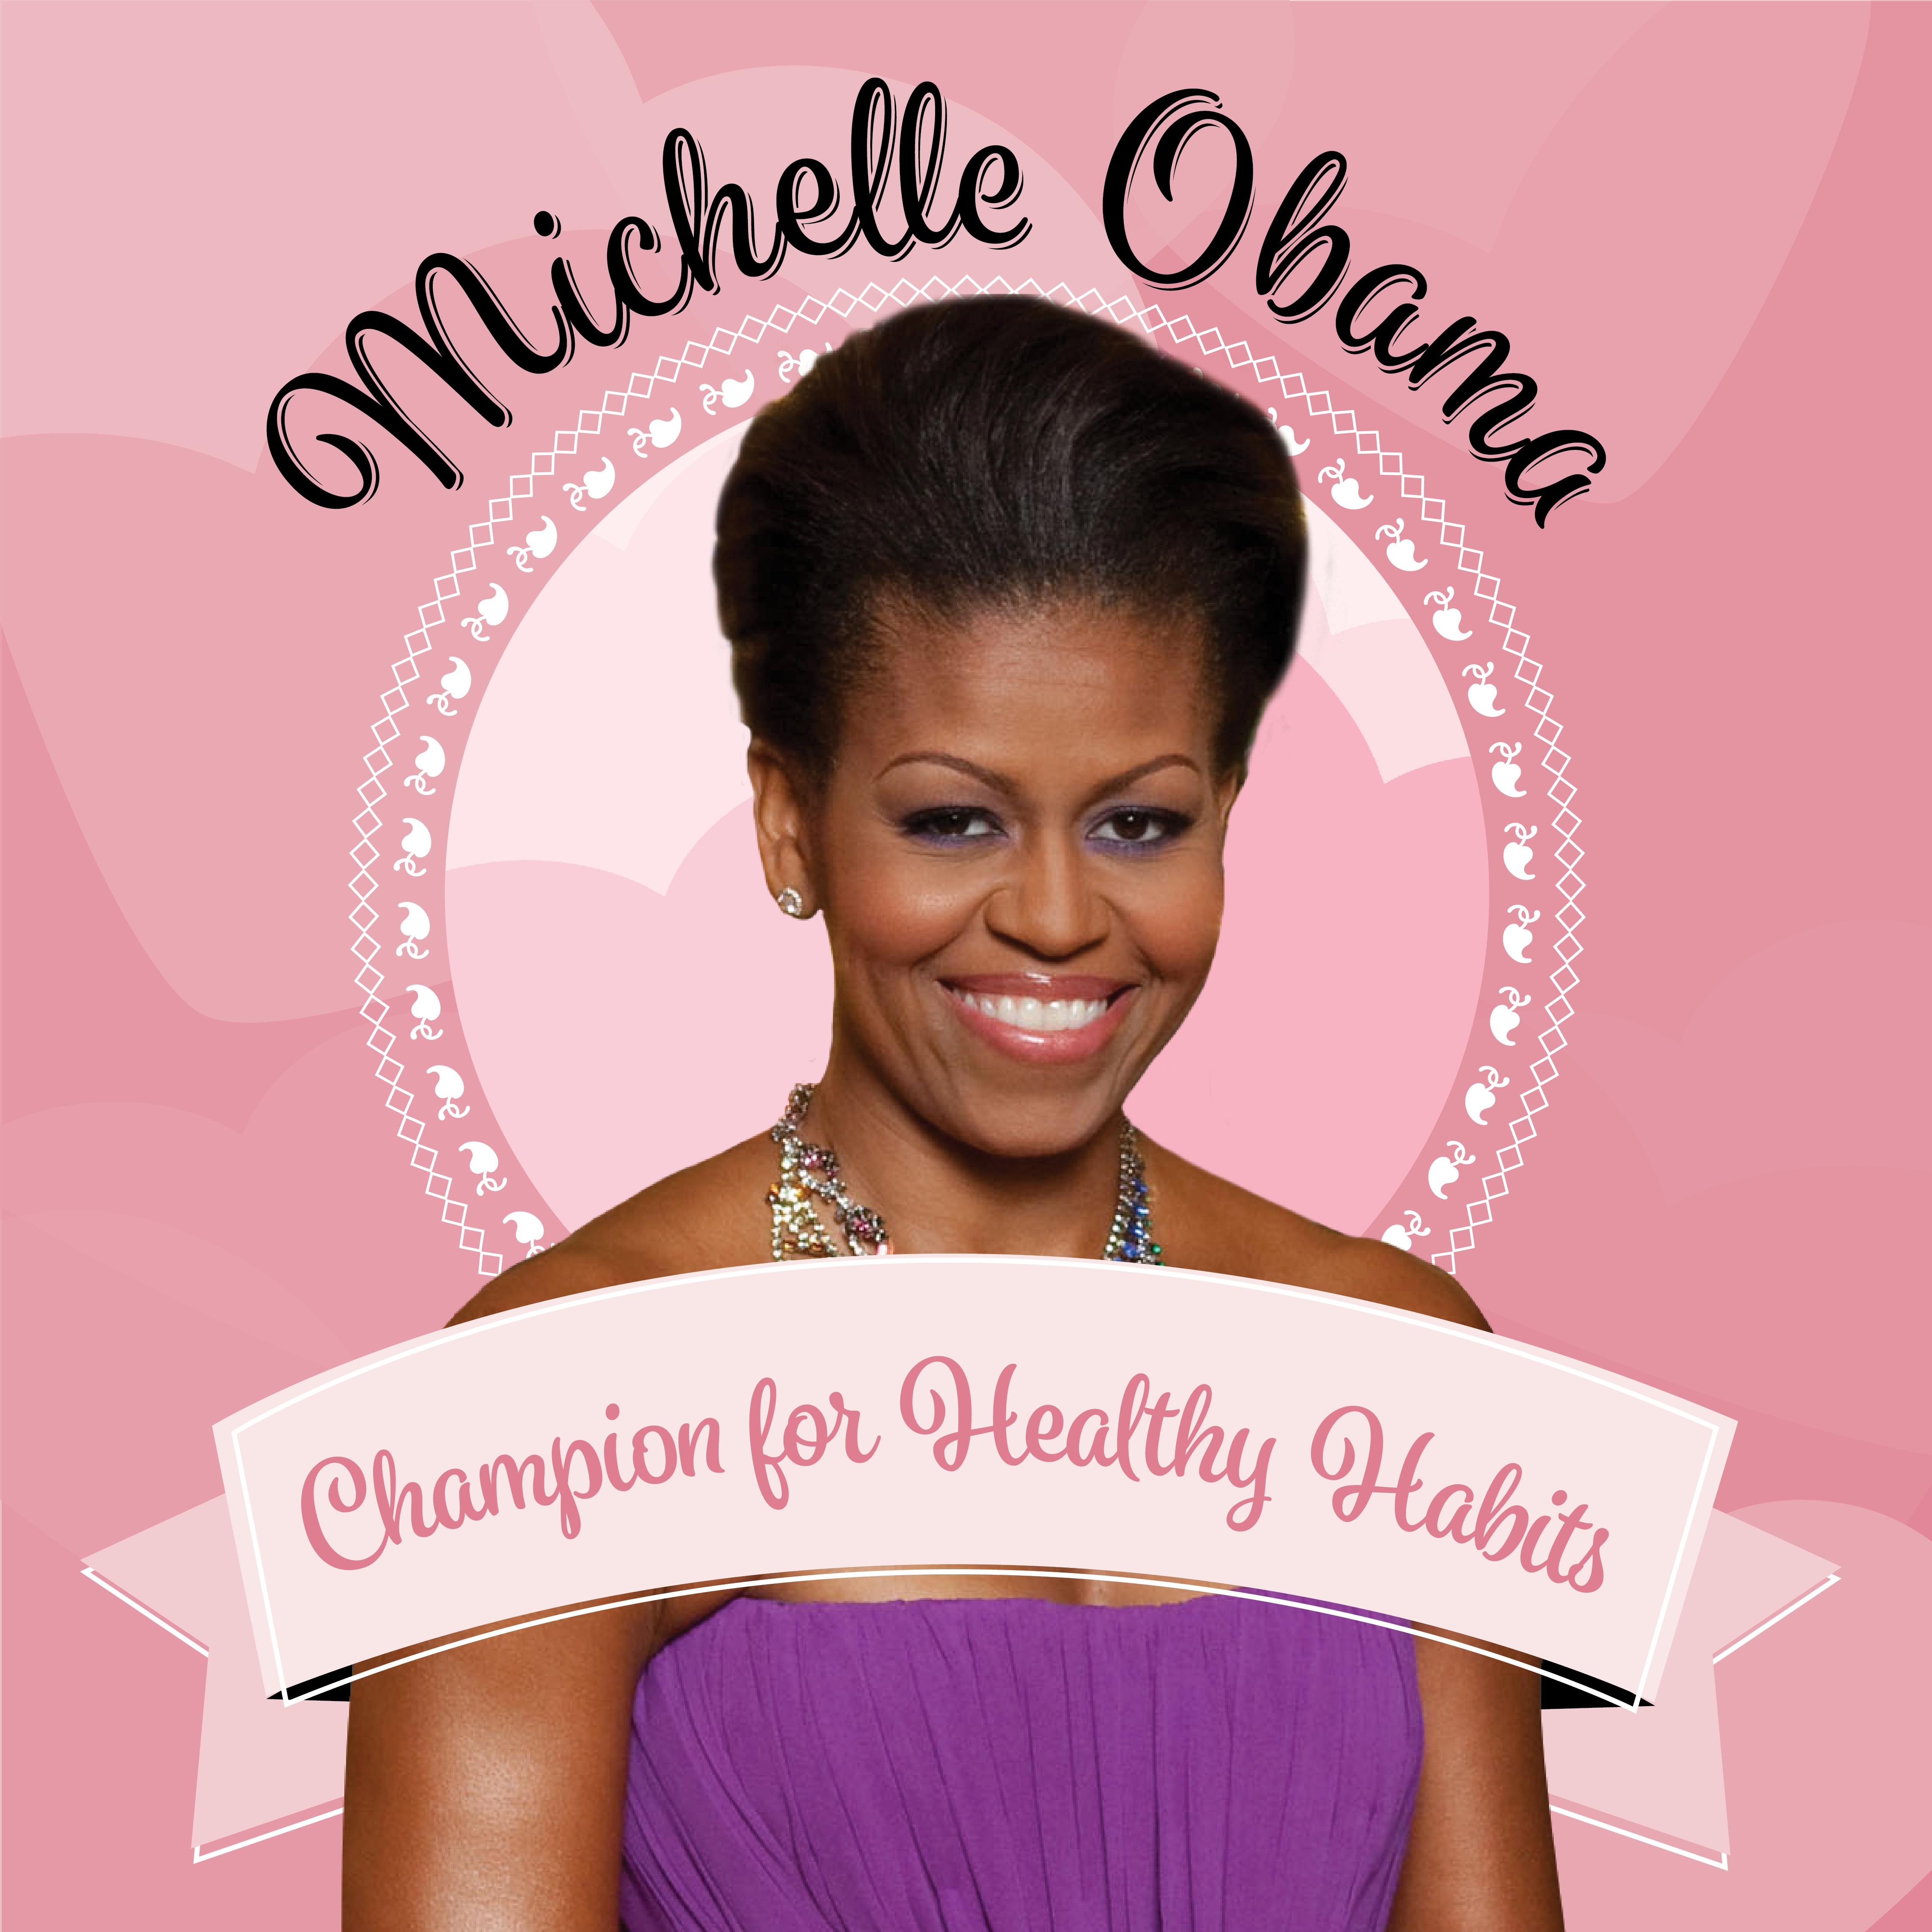 Michelle Obama Galentine Michelle Obama Happy Galentines Day Obama